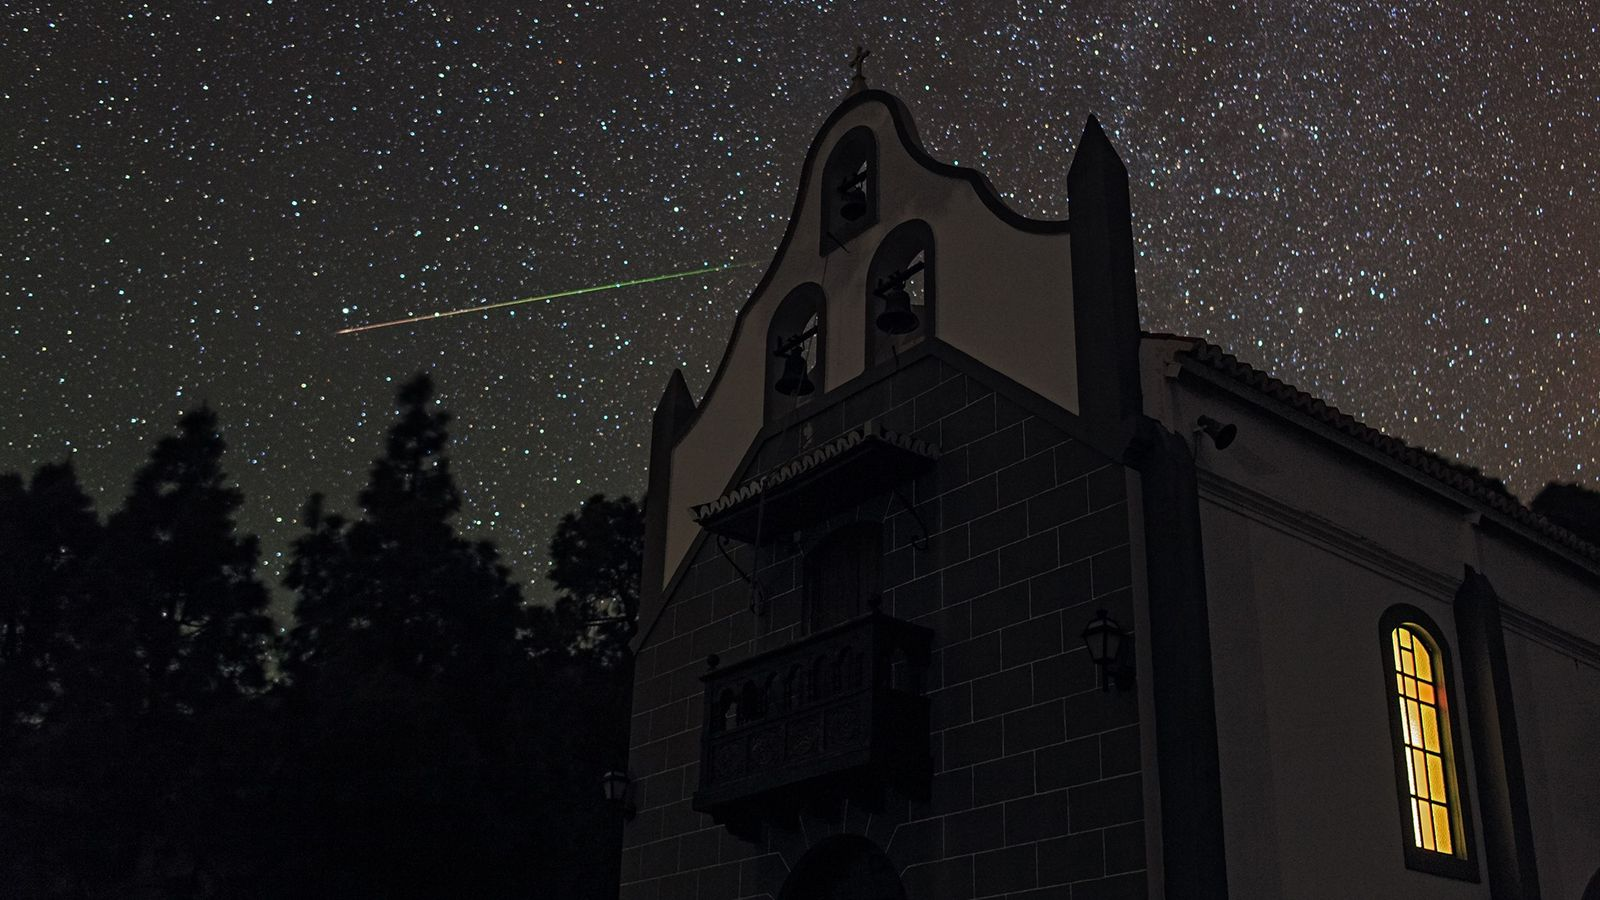 A meteor streaks through the constellation Ursa Minor, the little bear, as seen from La Palma ...